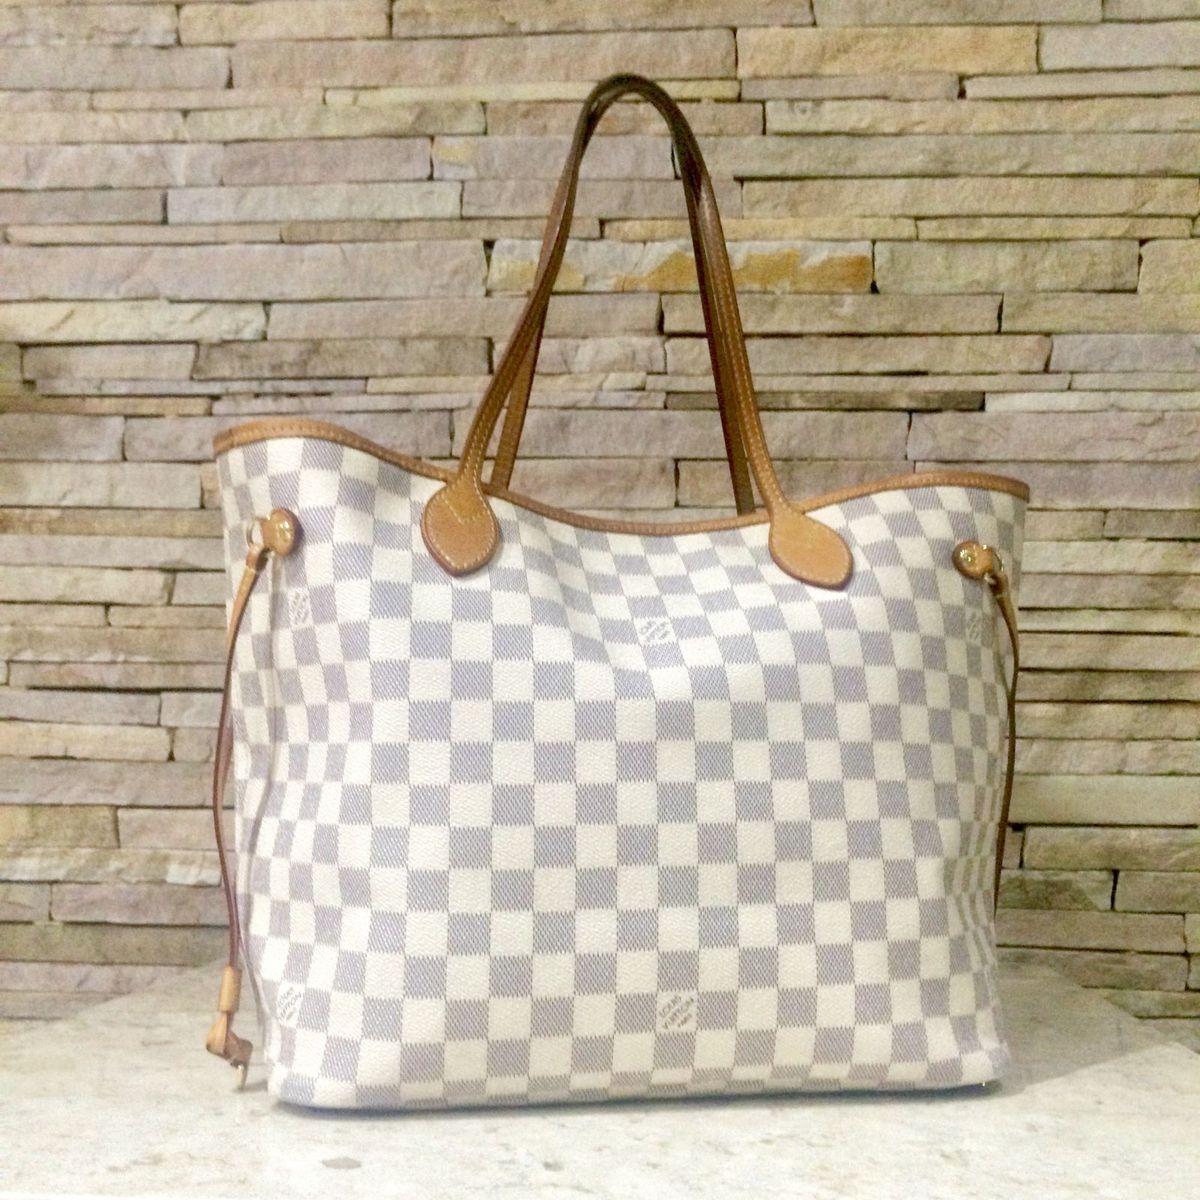 25ff680053 Bolsa Louis Vuitton Neverfull Mm Original | Bolsa de Ombro Feminina Louis  Vuitton Usado 2771759 | enjoei